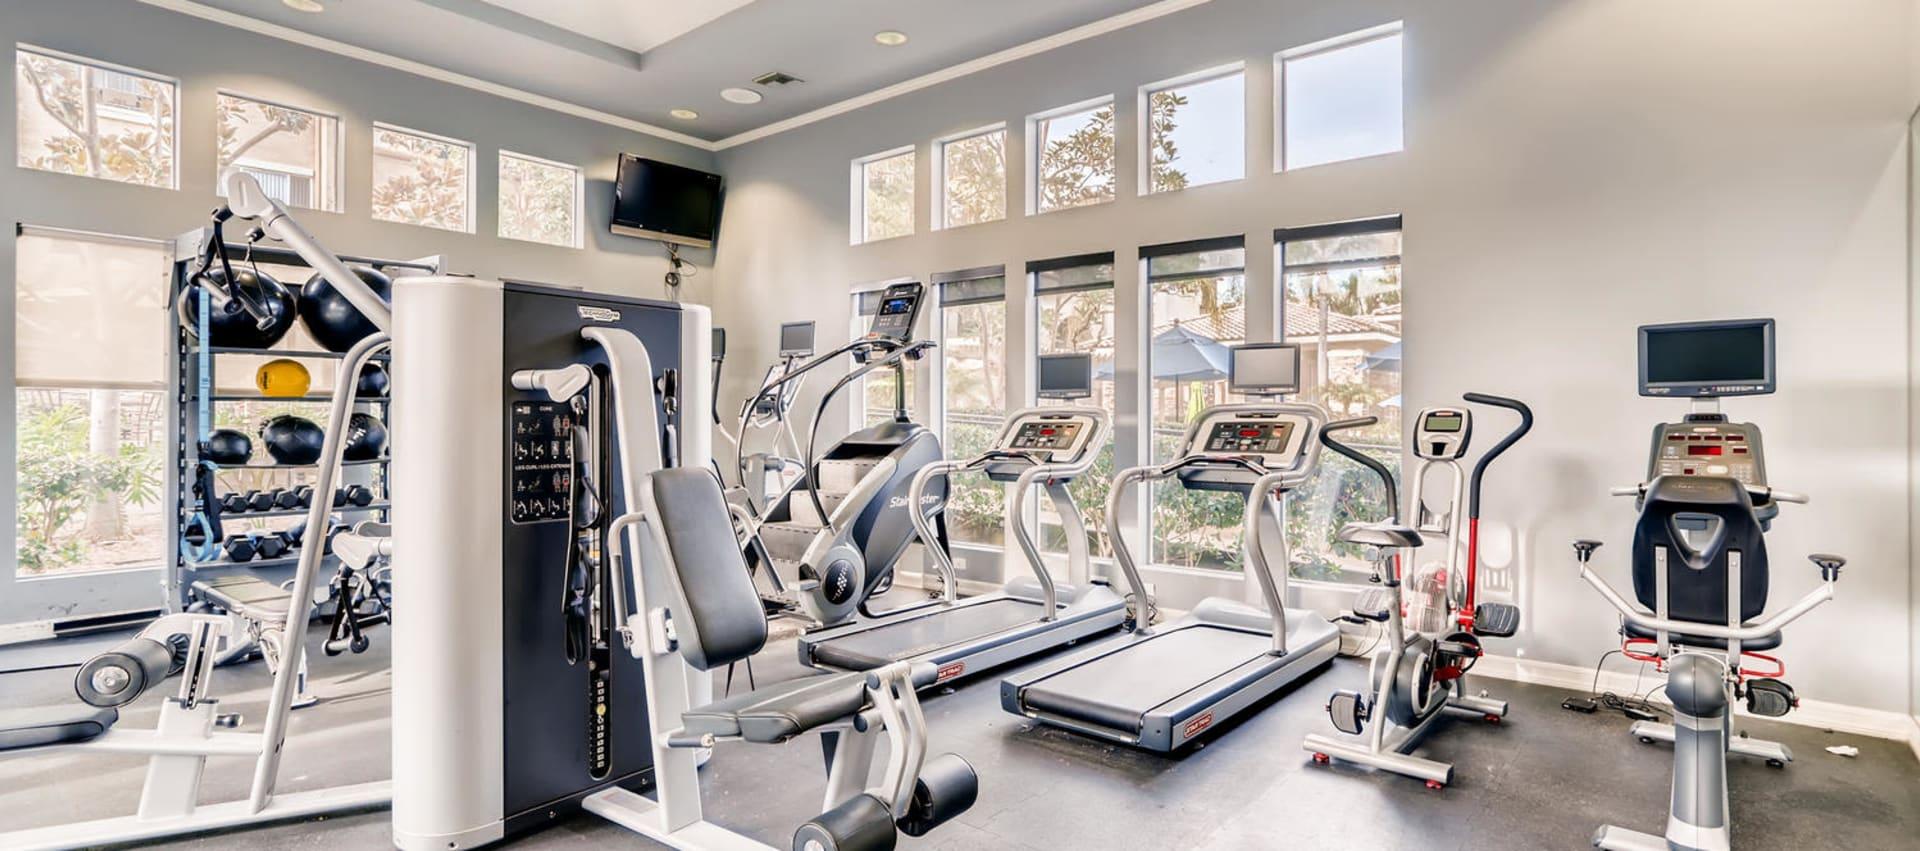 Fitness Center at Alize at Aliso Viejo Apartment Homes in Aliso Viejo, California